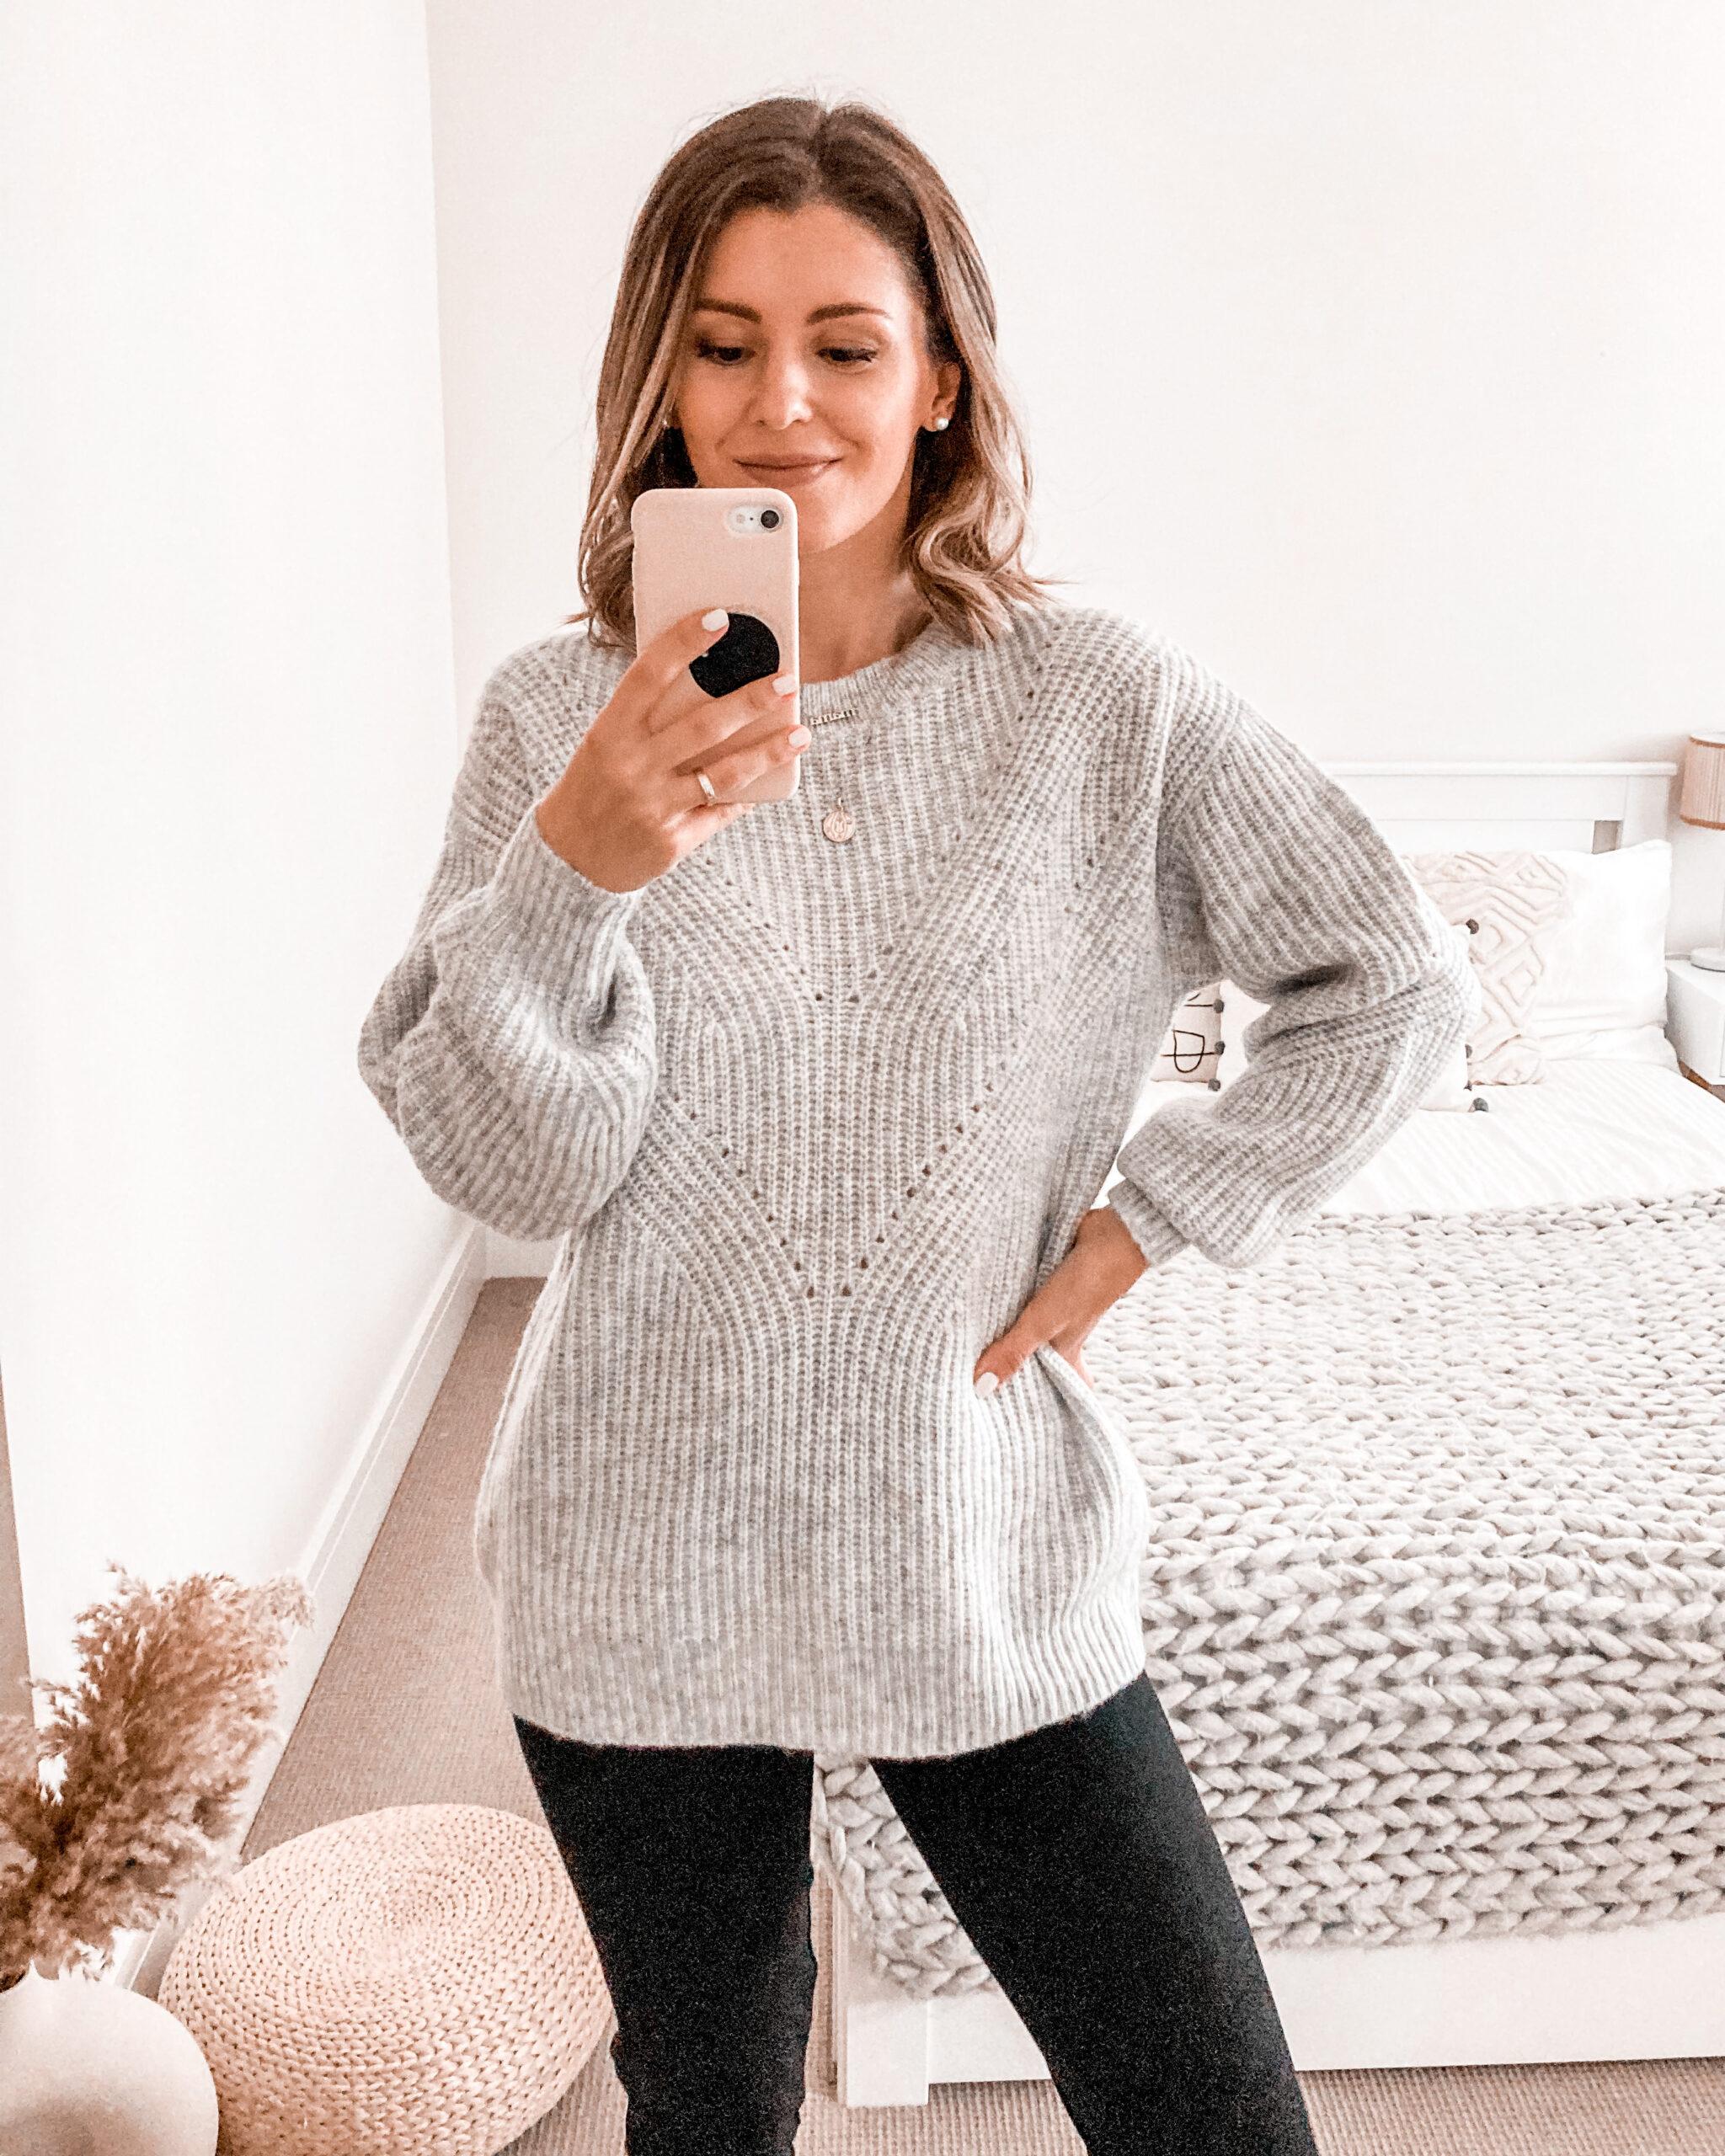 Gray rib Knit Jumper Tesco F&F Clothing UK Autumn Winter 2021